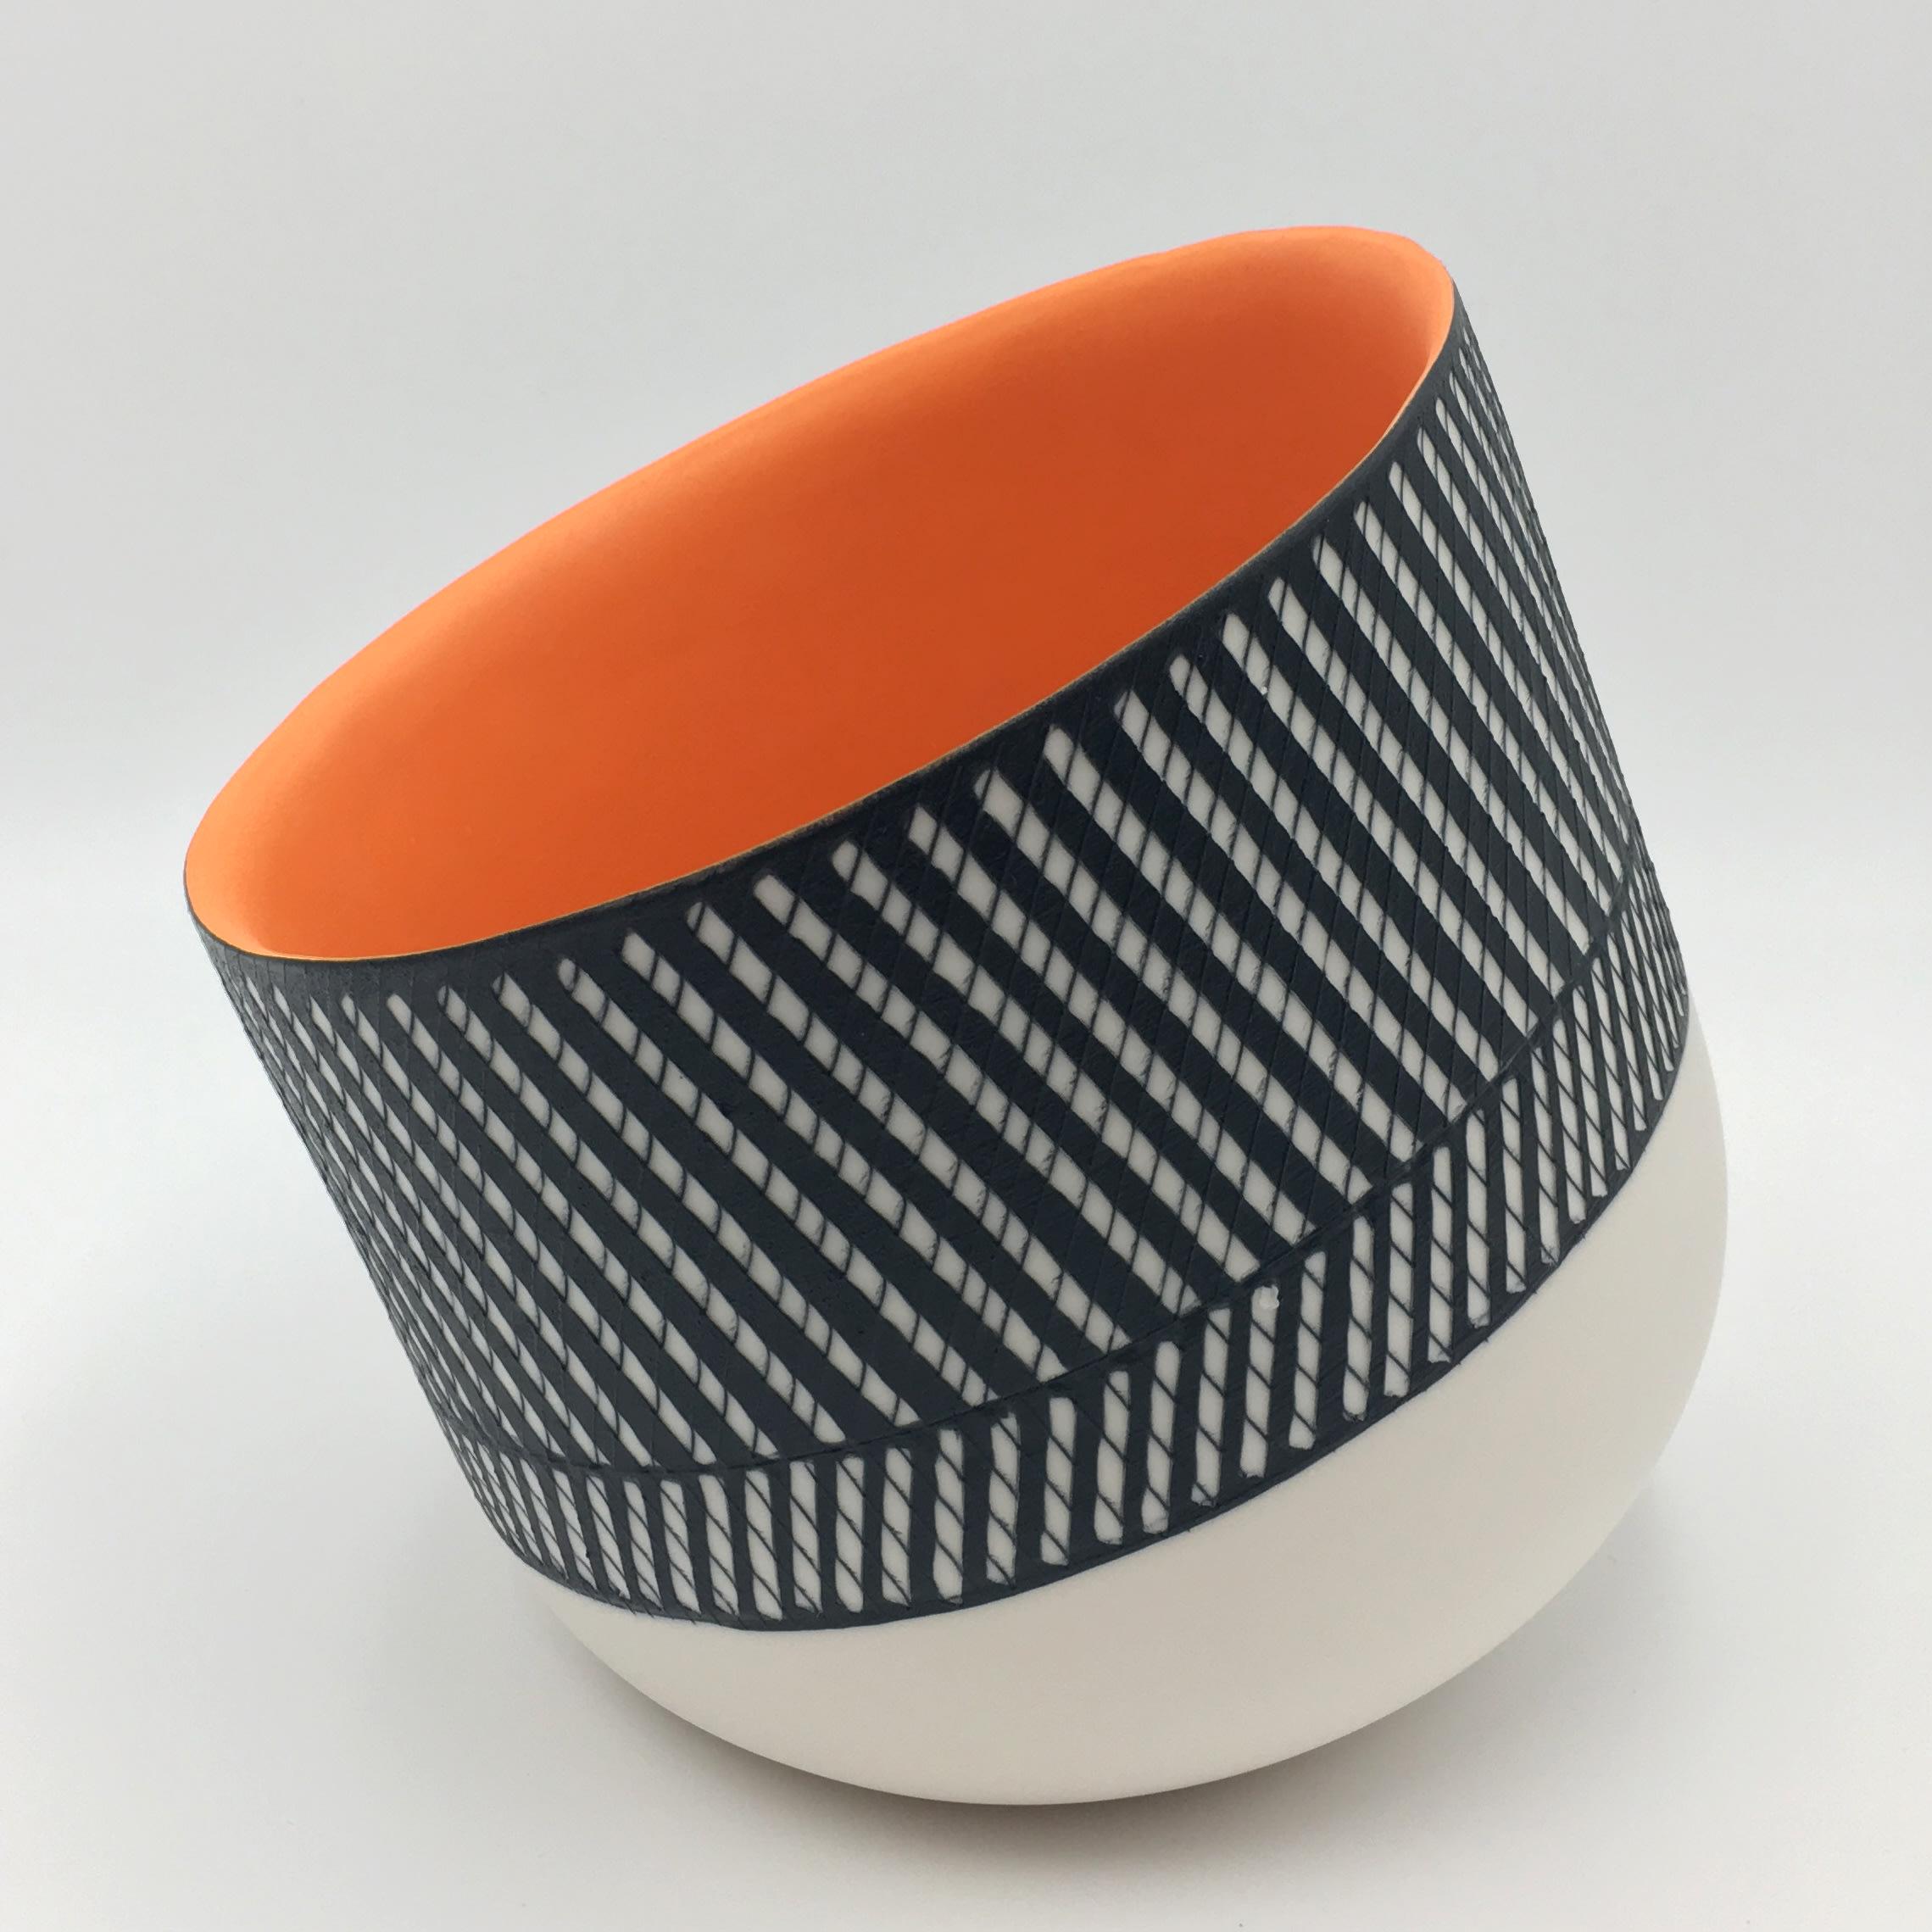 "<span class=""link fancybox-details-link""><a href=""/artists/195-lara-scobie/works/6513-lara-scobie-tilted-bowl-with-orange-interior-2019/"">View Detail Page</a></span><div class=""artist""><strong>Lara Scobie</strong></div> b. 1967 <div class=""title""><em>Tilted Bowl with Orange Interior</em>, 2019</div> <div class=""medium"">Porcelain</div><div class=""copyright_line"">Own Art: £45 x 10 Months, 0% APR</div>"